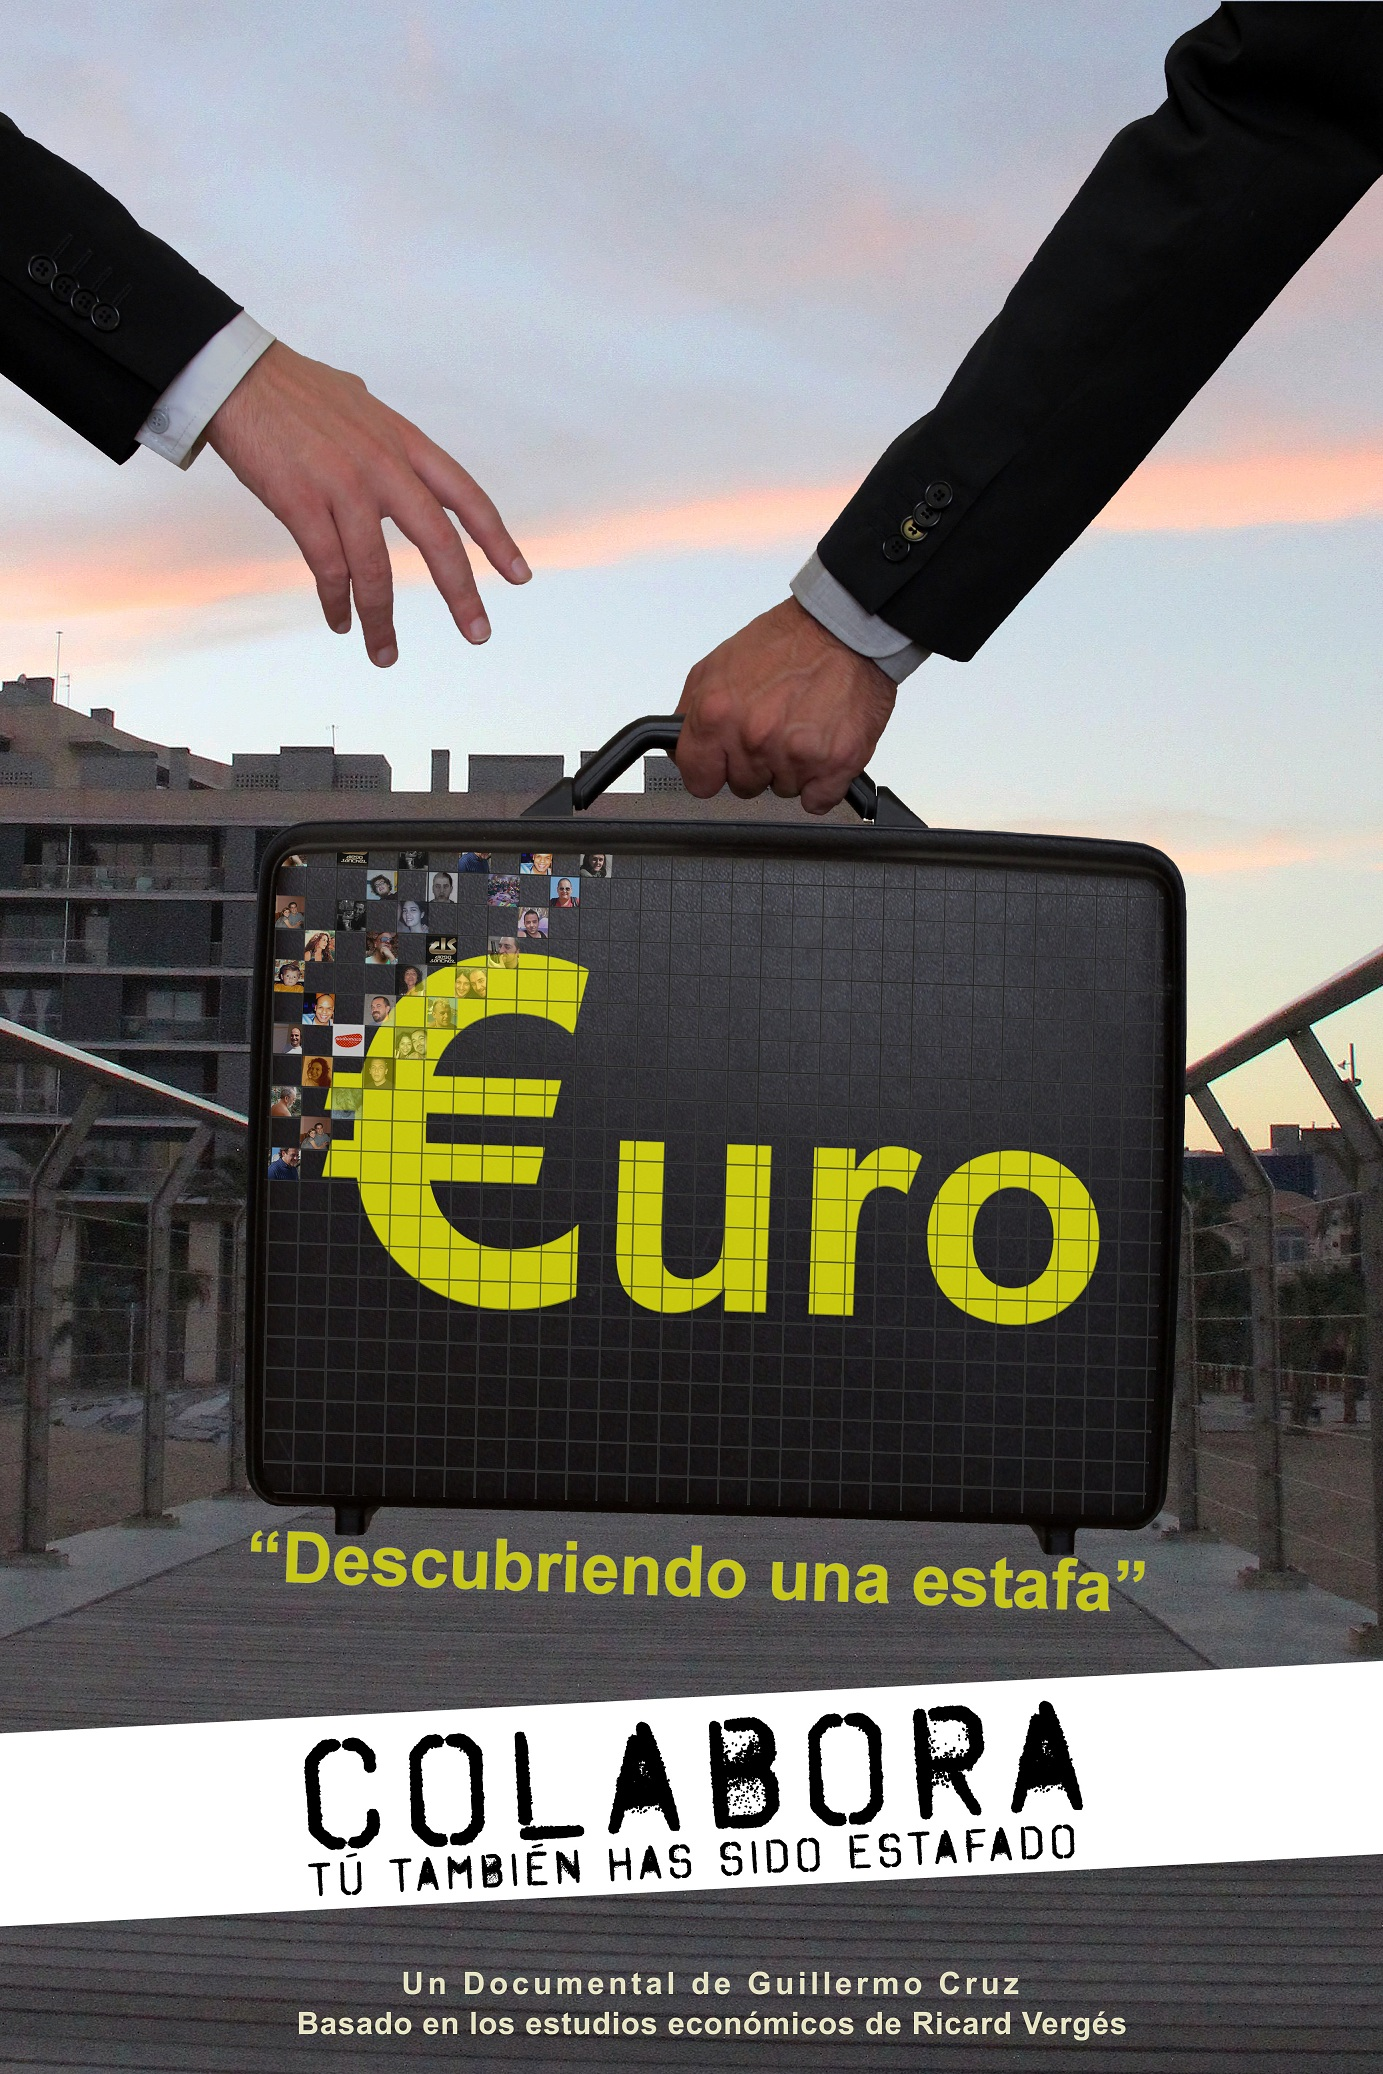 euroestafa